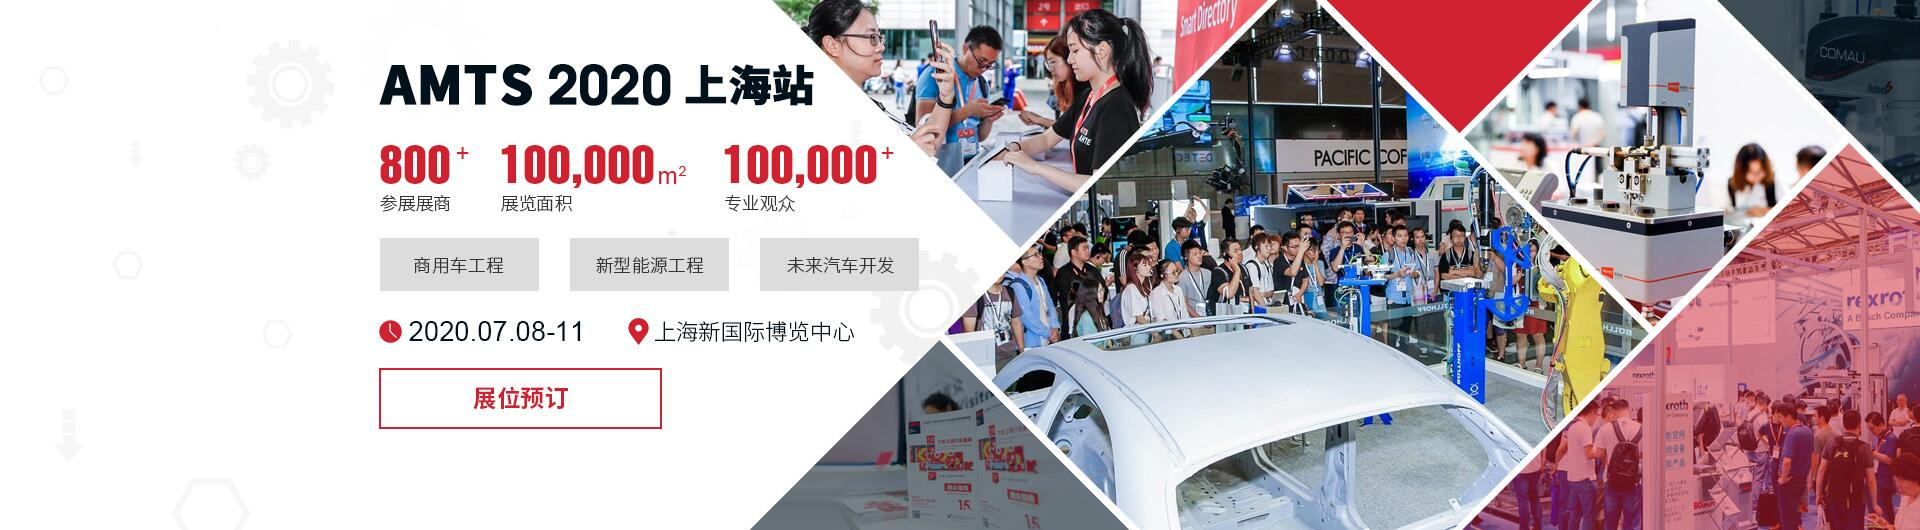 AMTS 2020 上海站